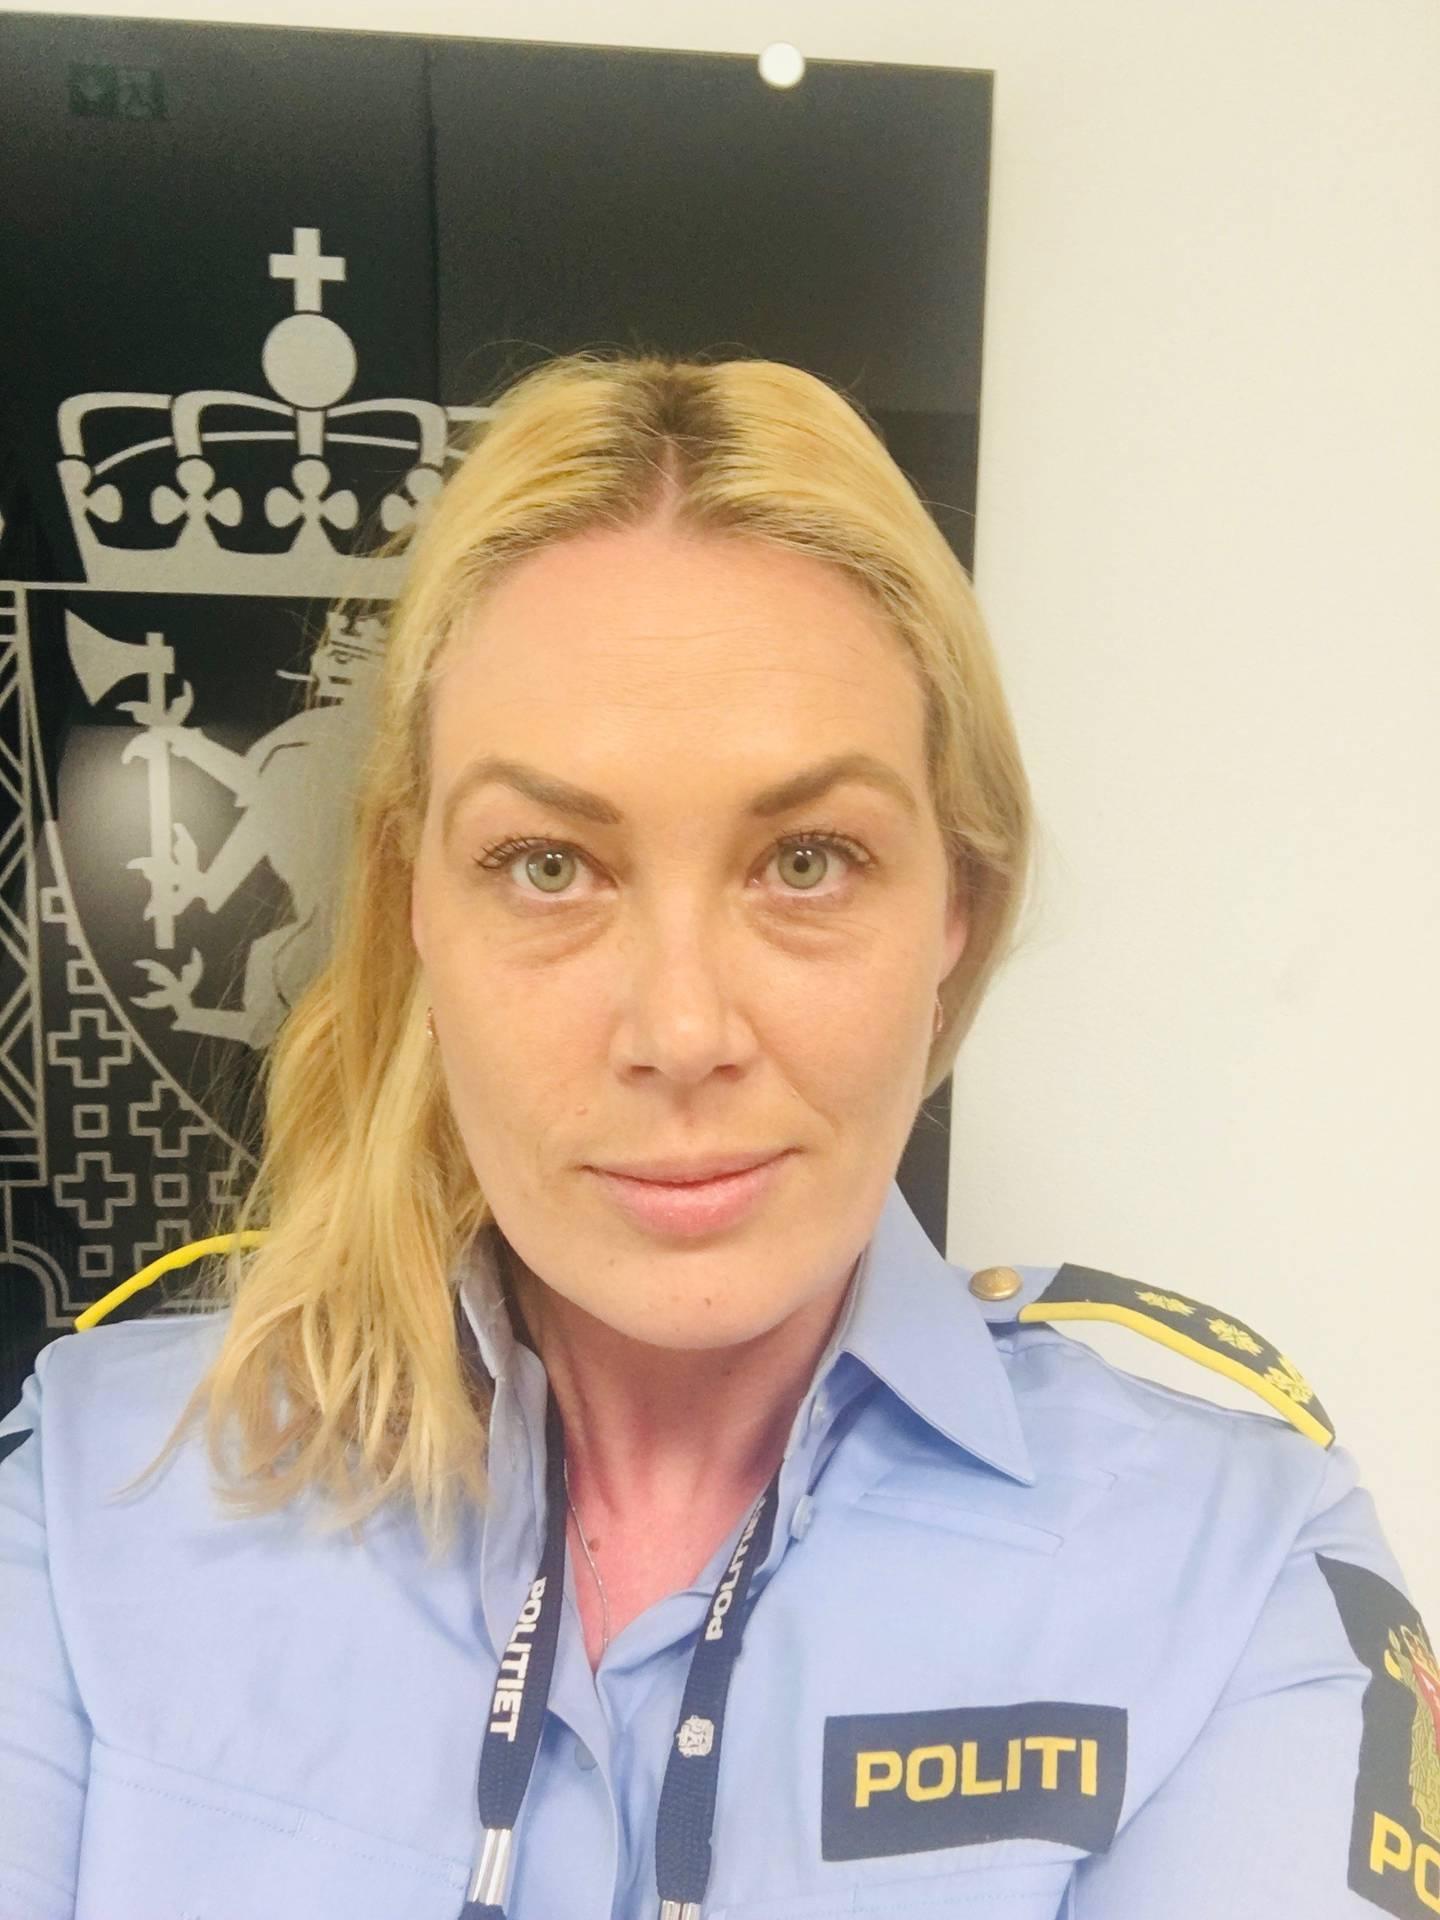 Politiadvokat Thea Sletto Øverseth i Øst politidistrikt.